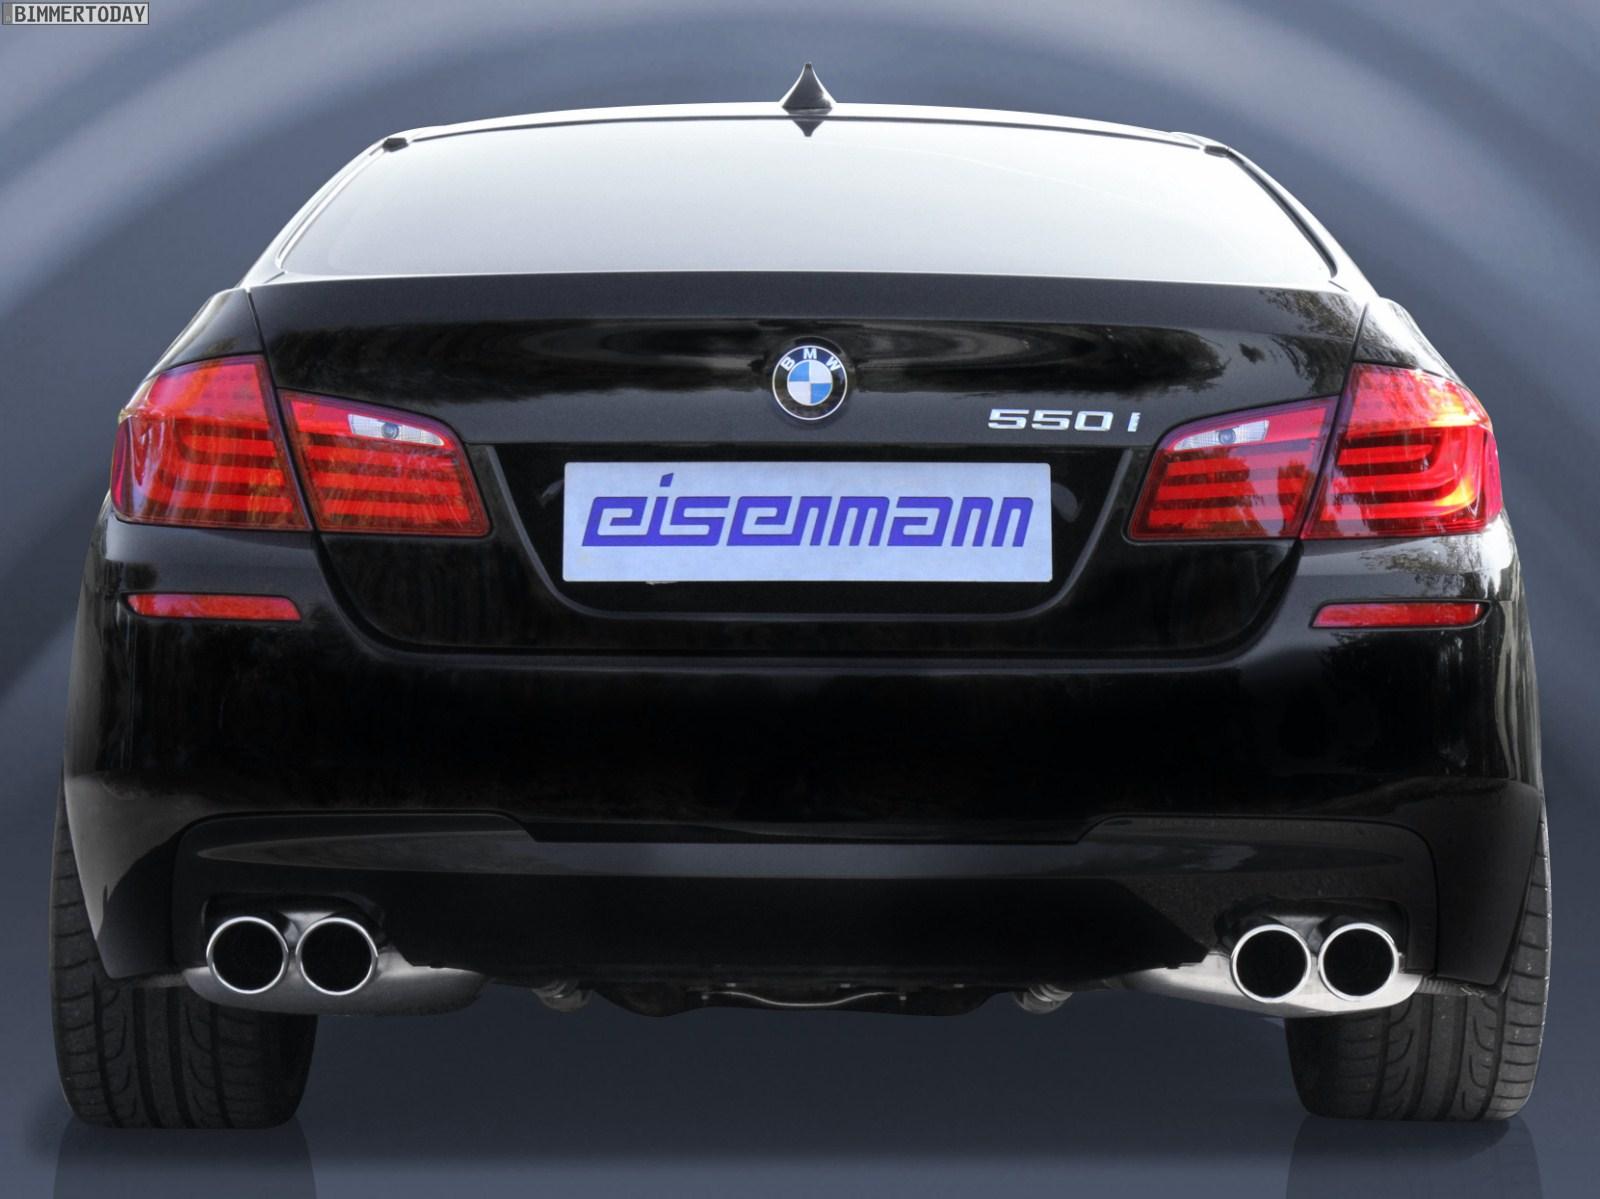 eisenmann exhaust system for bmw 550i. Black Bedroom Furniture Sets. Home Design Ideas